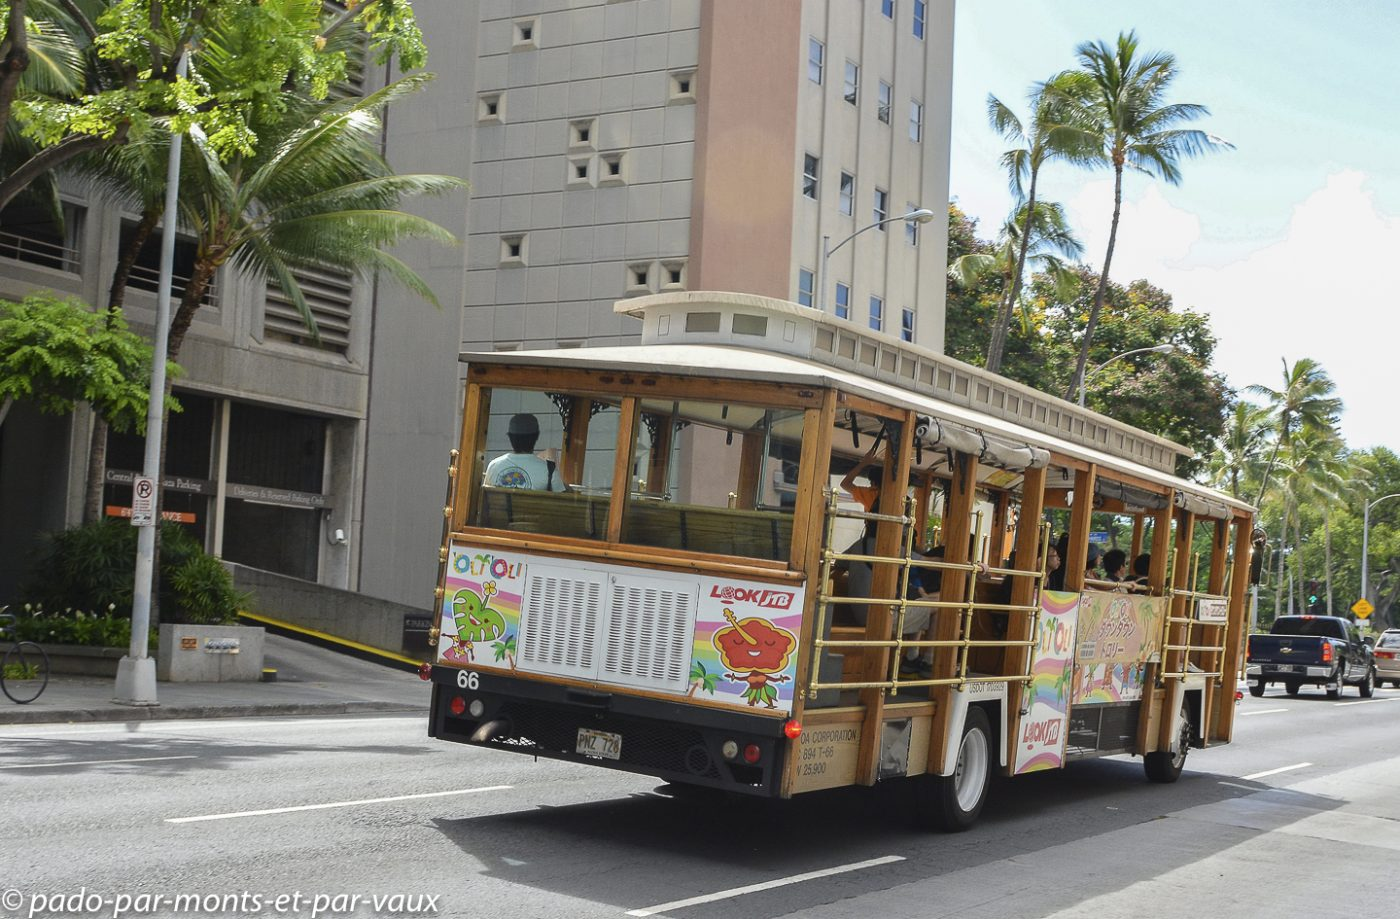 Honolulu - Downtown